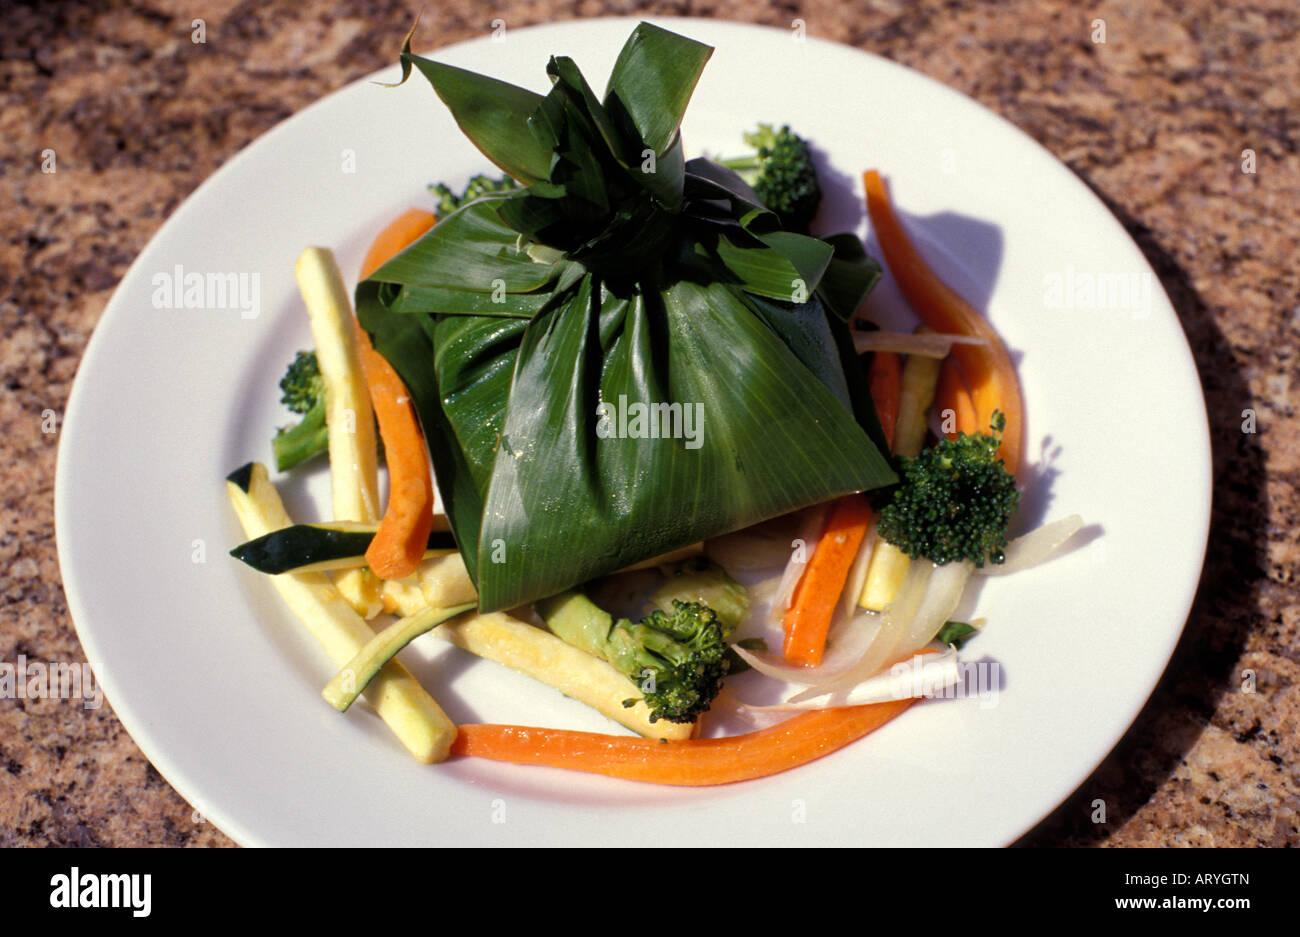 A Presentation Of Lau Lau A Hawaiian Meal Of Pork Chicken Or Fish Stock Photo Alamy